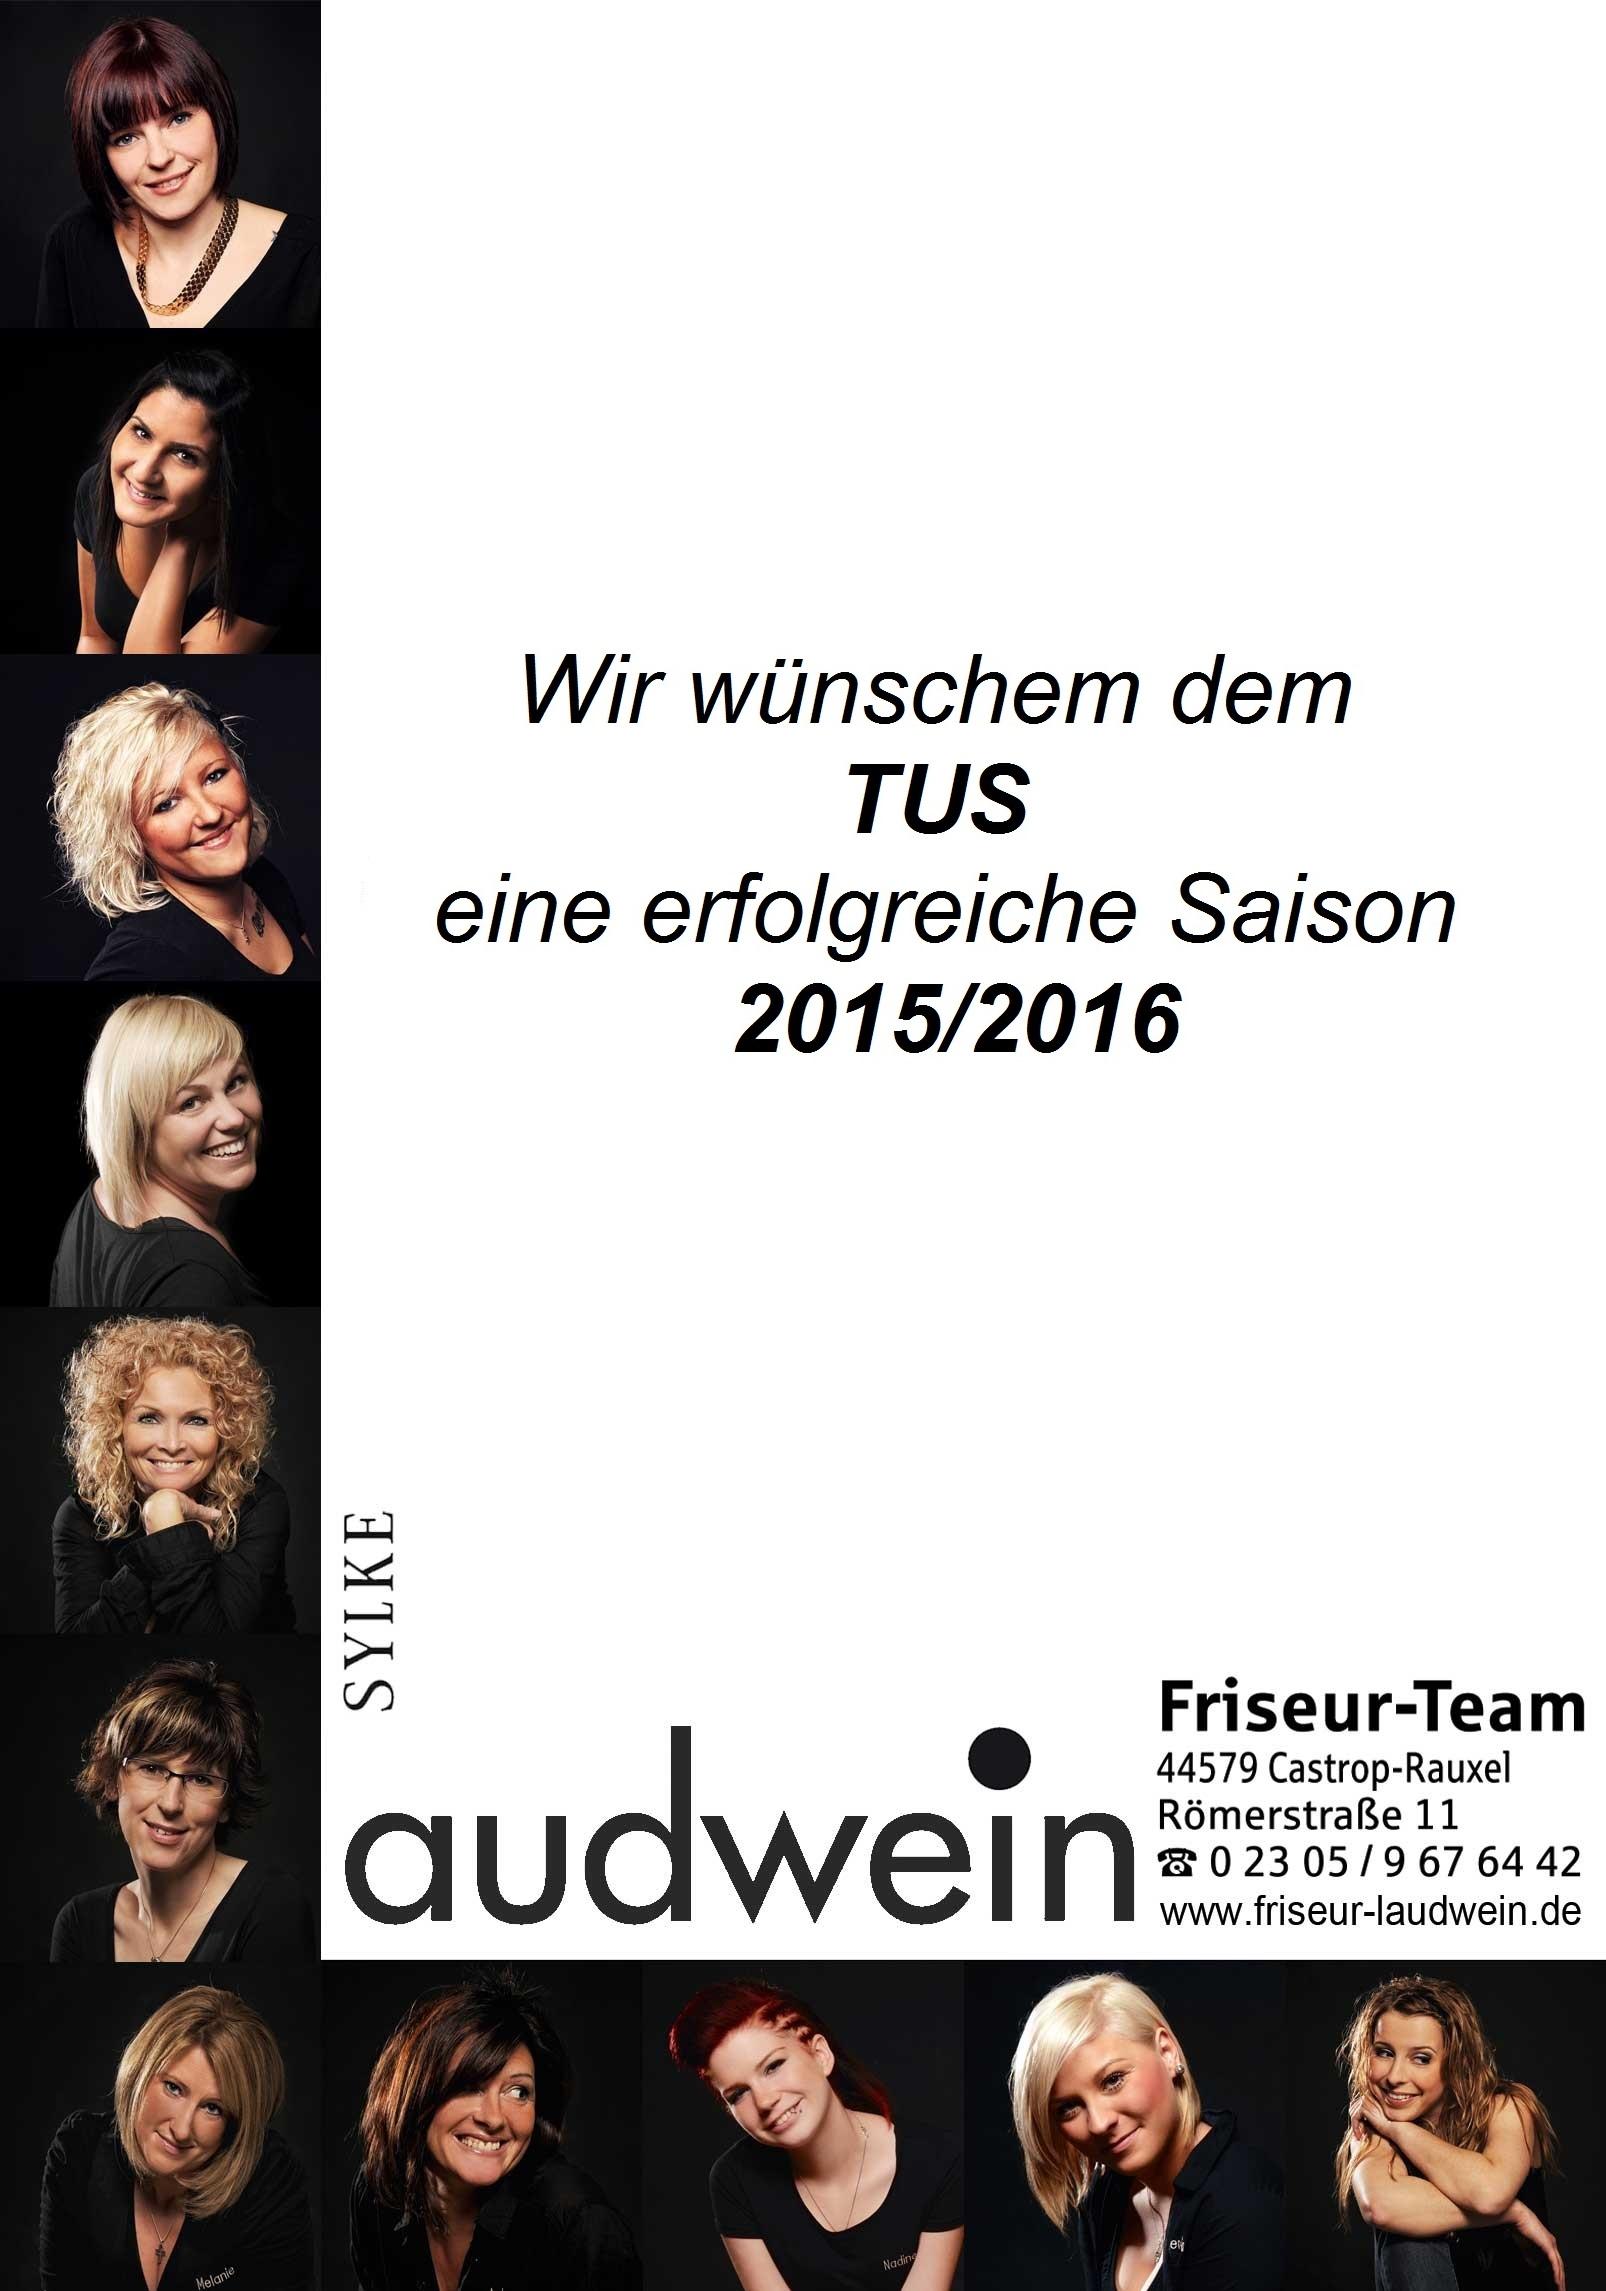 Sylke Laudwein - Friseur Team